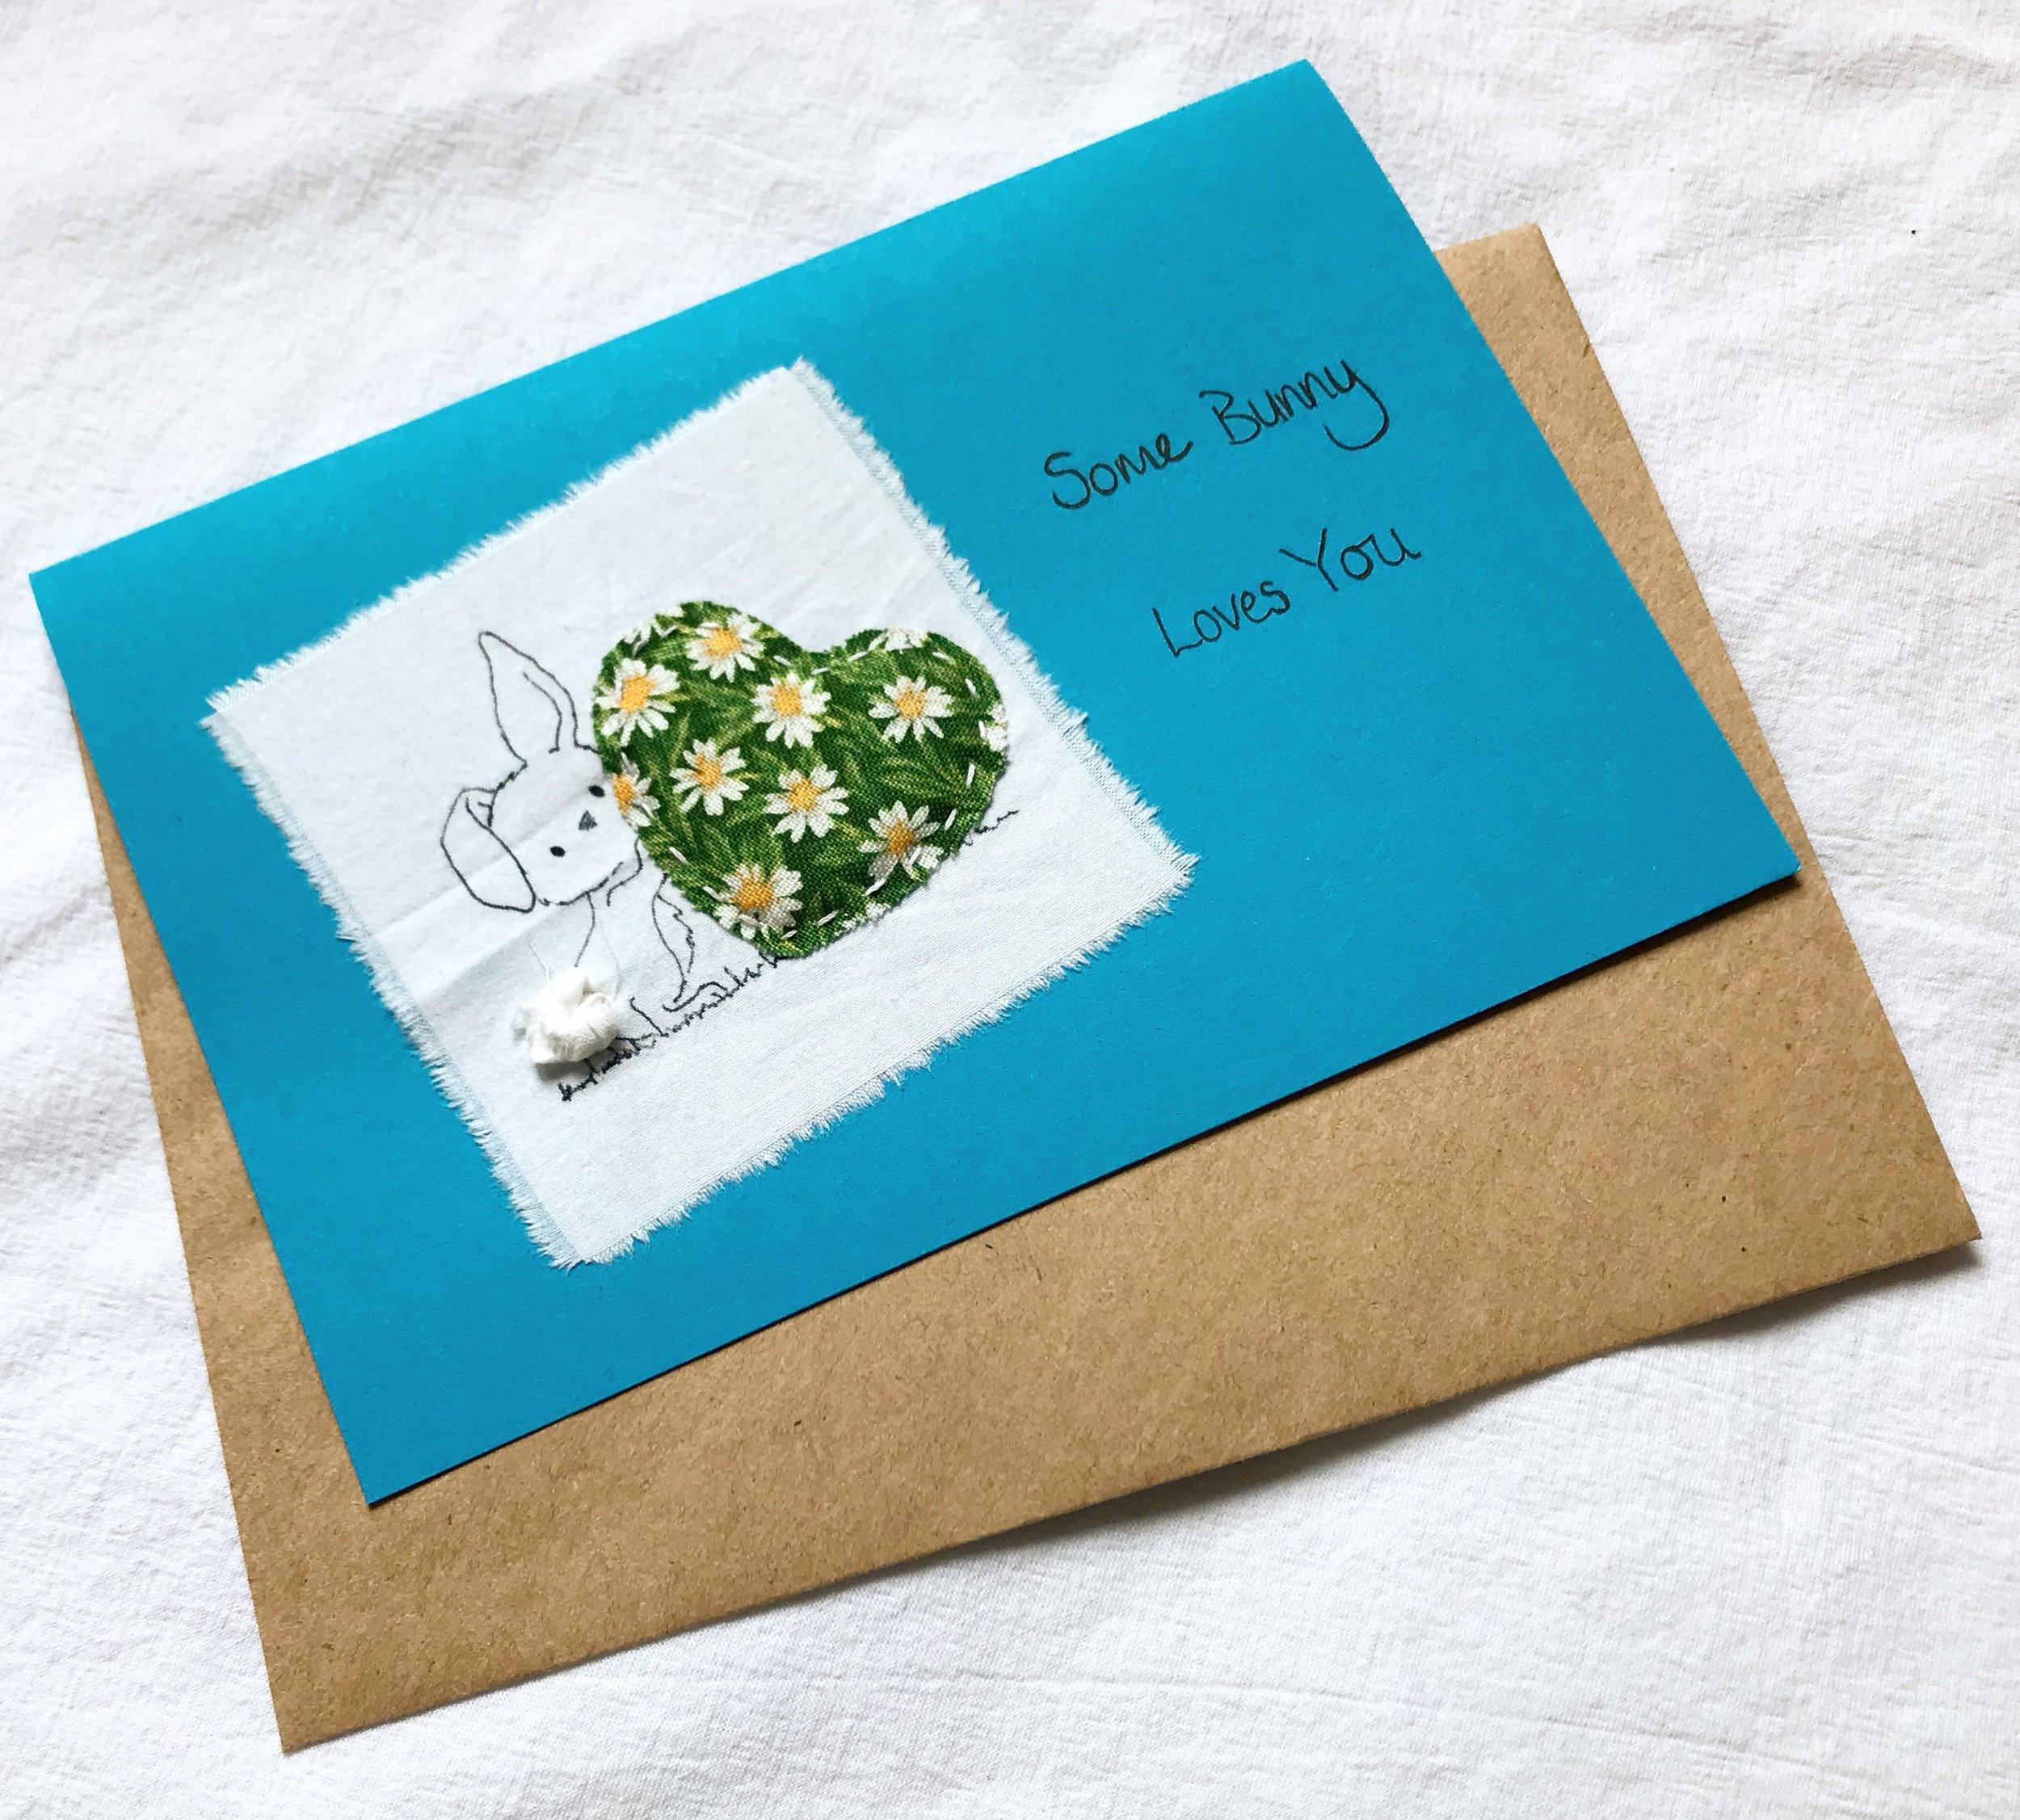 bunny+love+note+by+csevenm.jpg